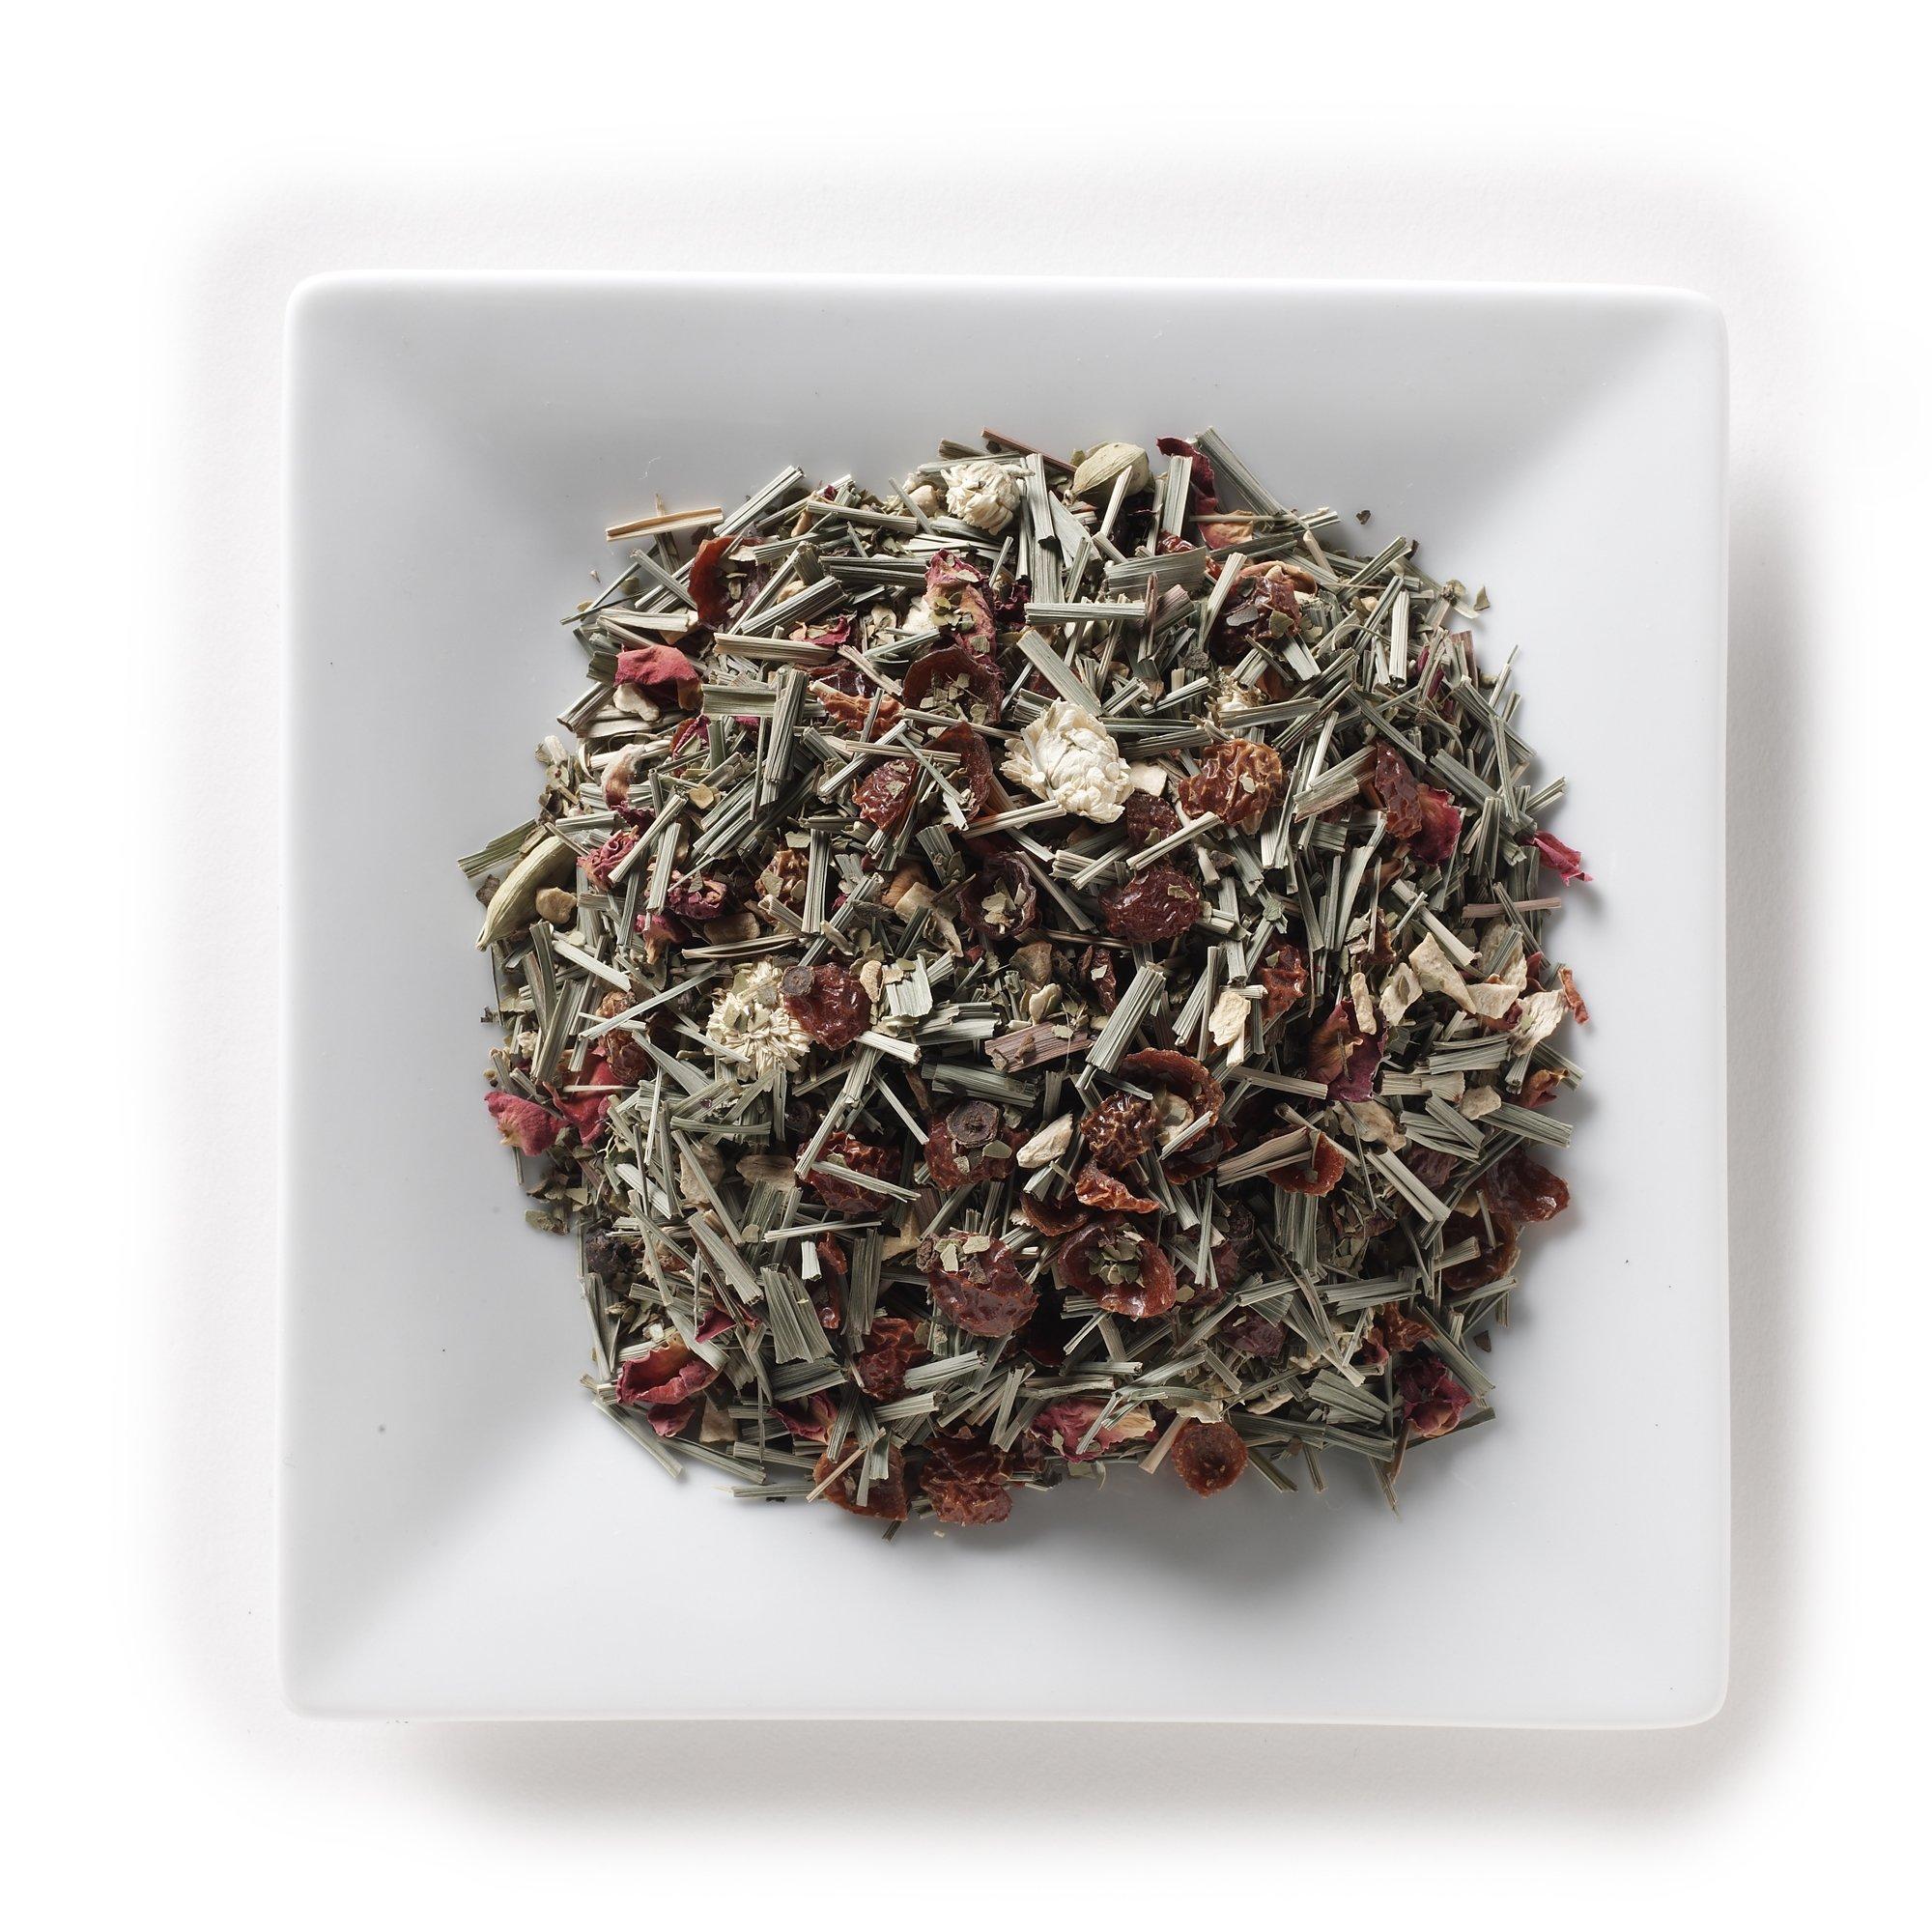 Mahamosa Ginger Spice Mate Tea 2 oz - Loose Leaf Herbal Spice Tea Blend (with green mate, lemon grass, rose hip peel, ginger pieces, cardamom, black pepper, basil, rose petals, Roman chamomile)